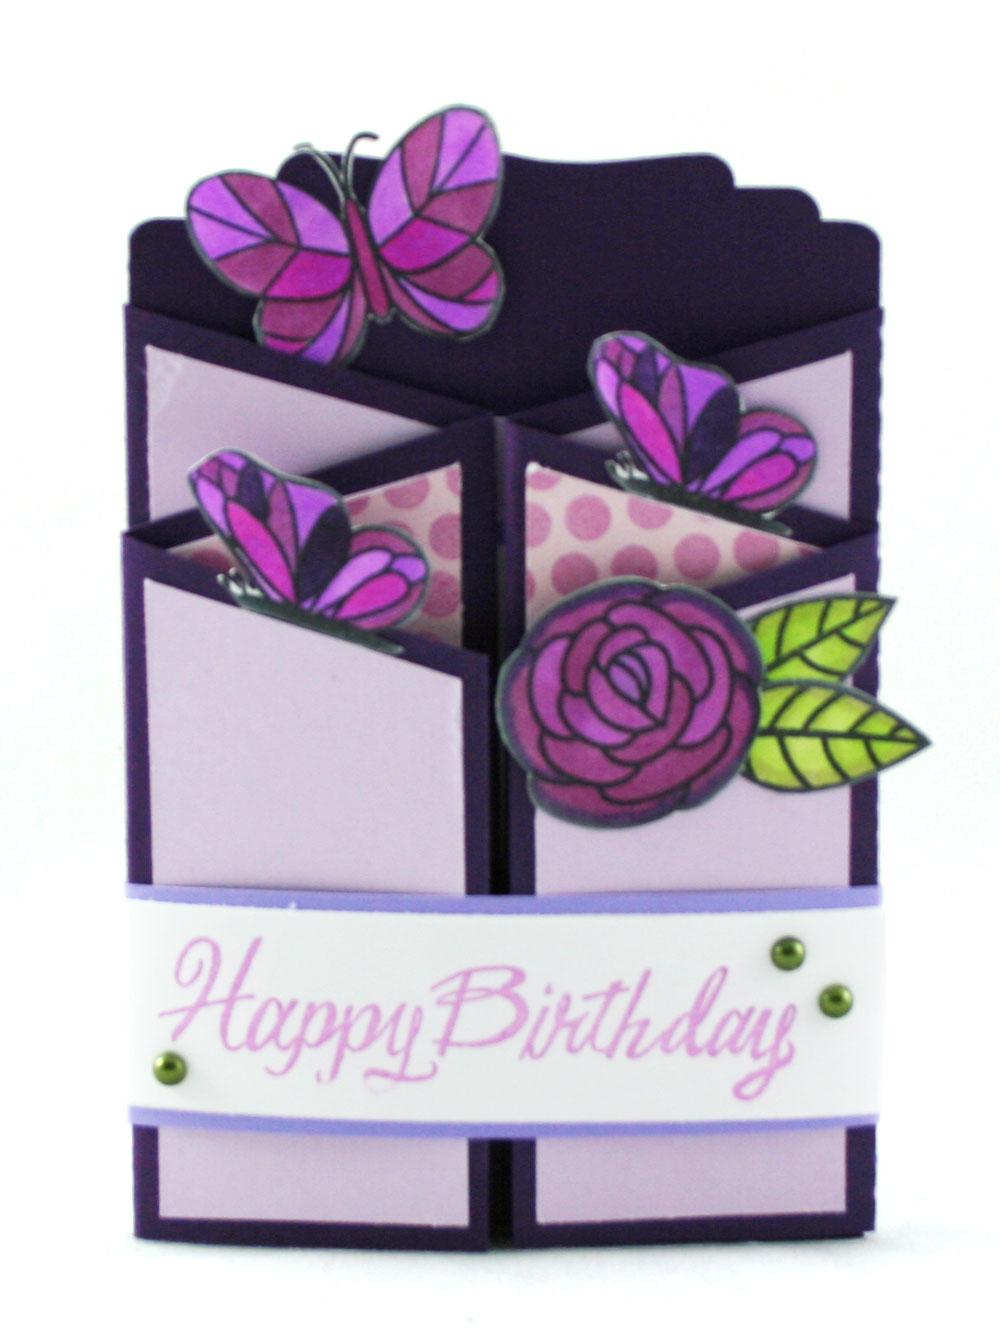 Fun Folds Gate Fold Birthday Card